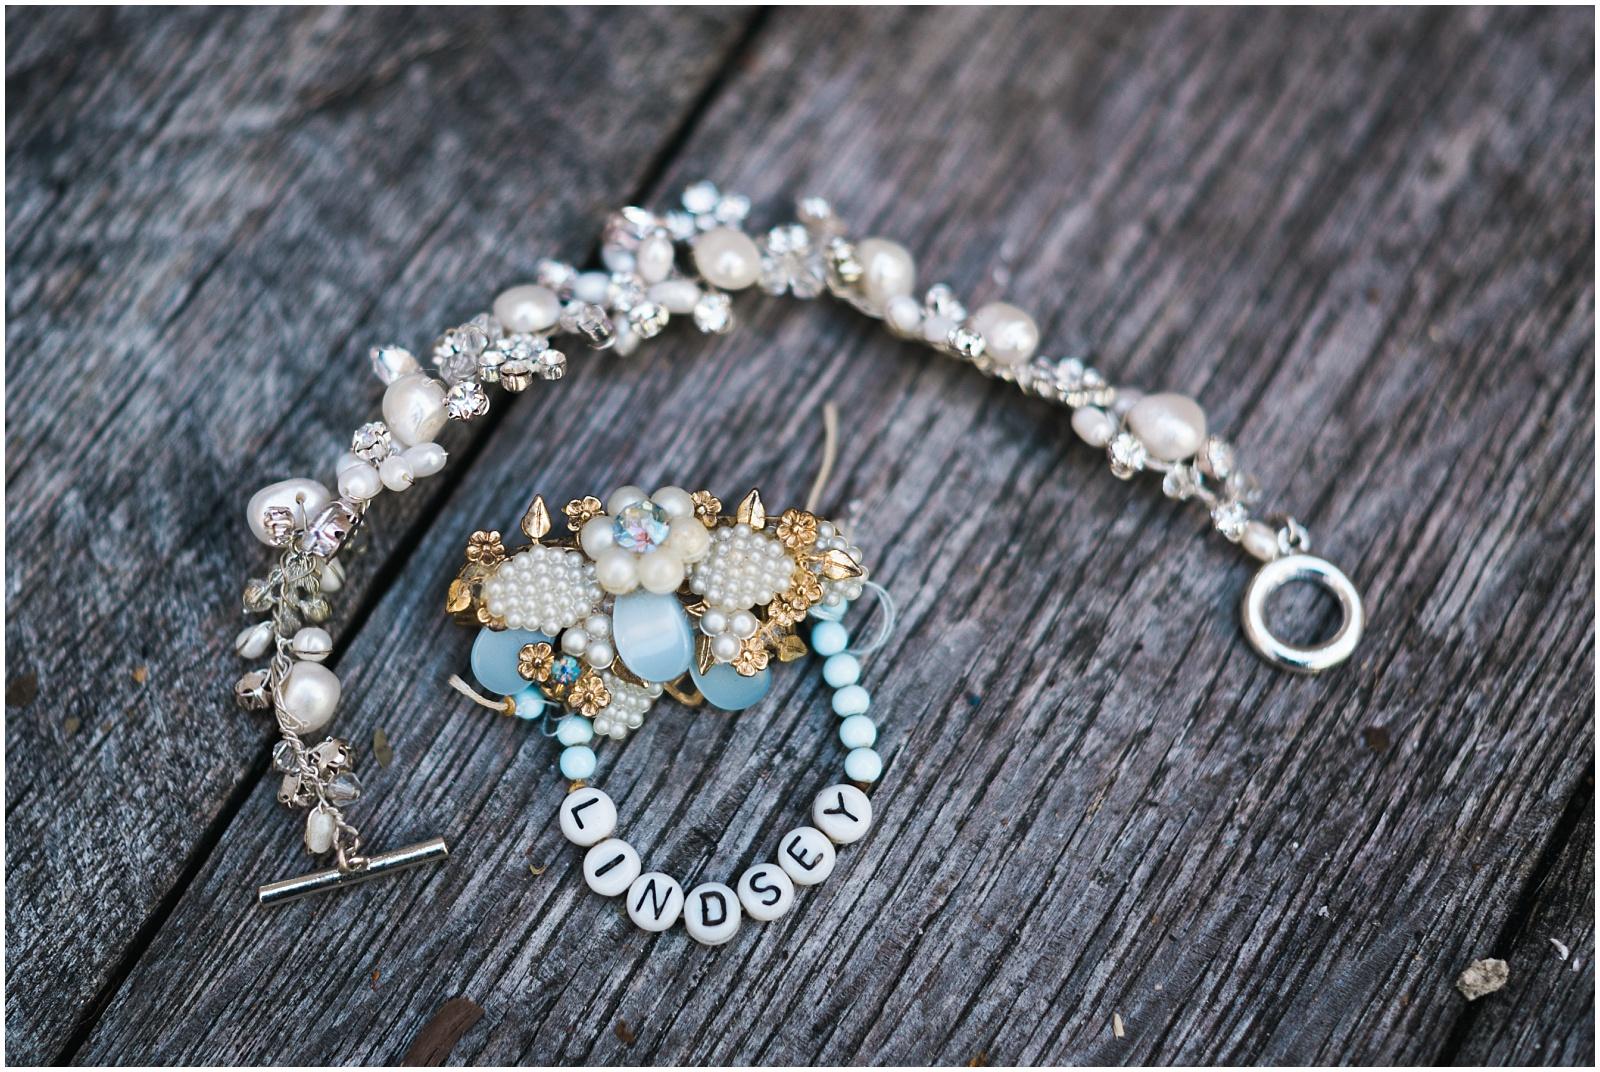 Jewelry detail image